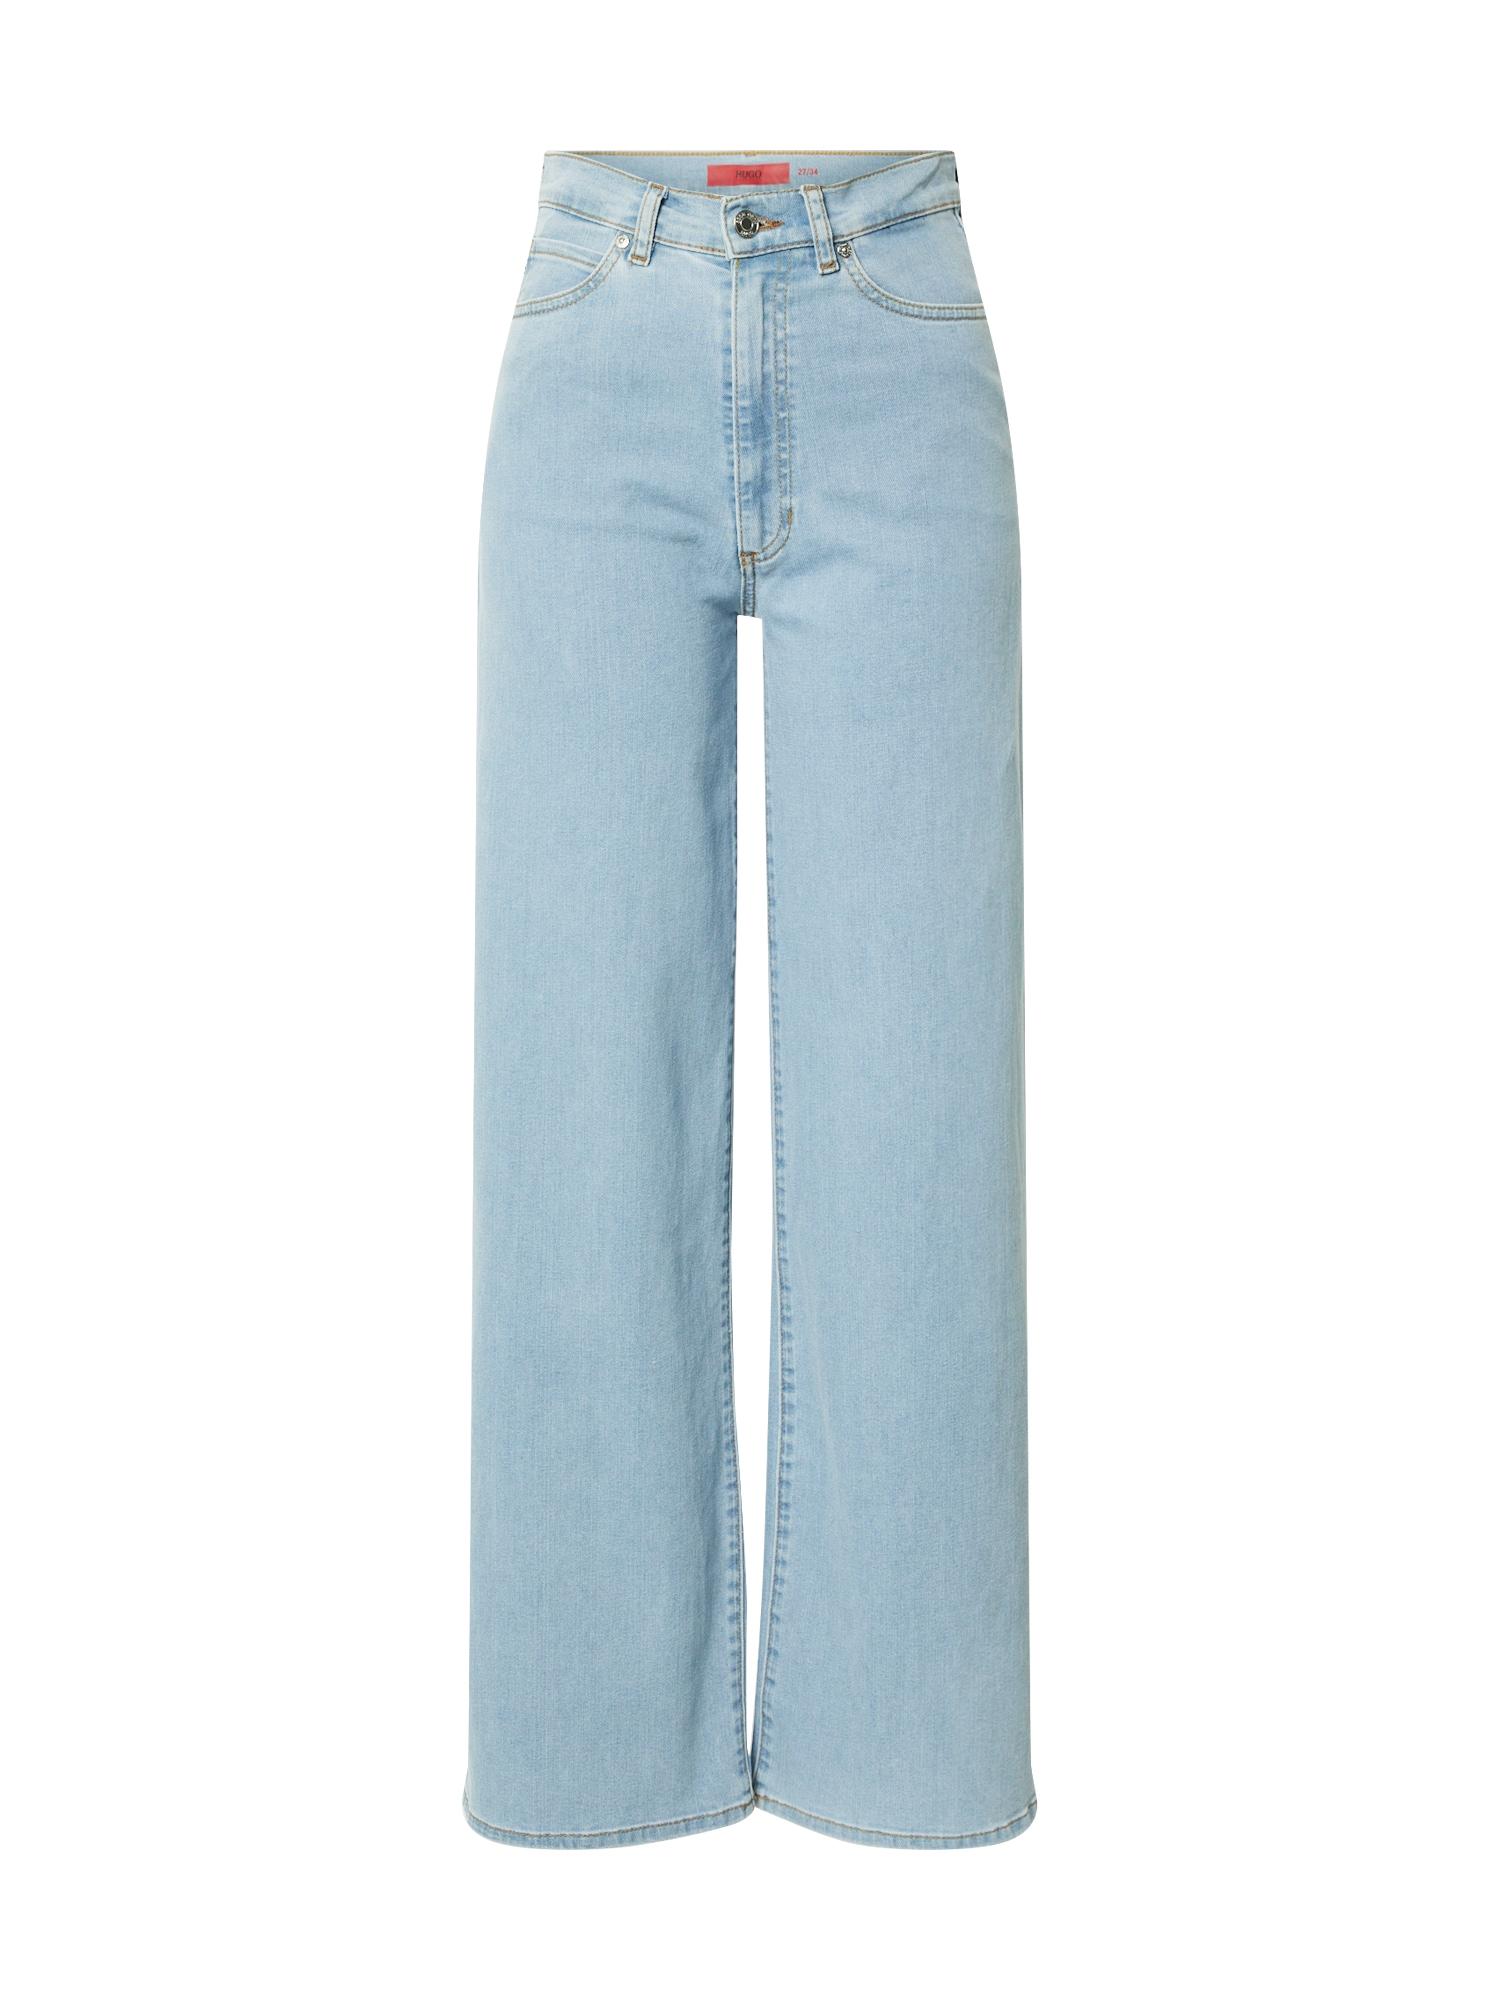 HUGO Džinsai 'Gialda' tamsiai (džinso) mėlyna